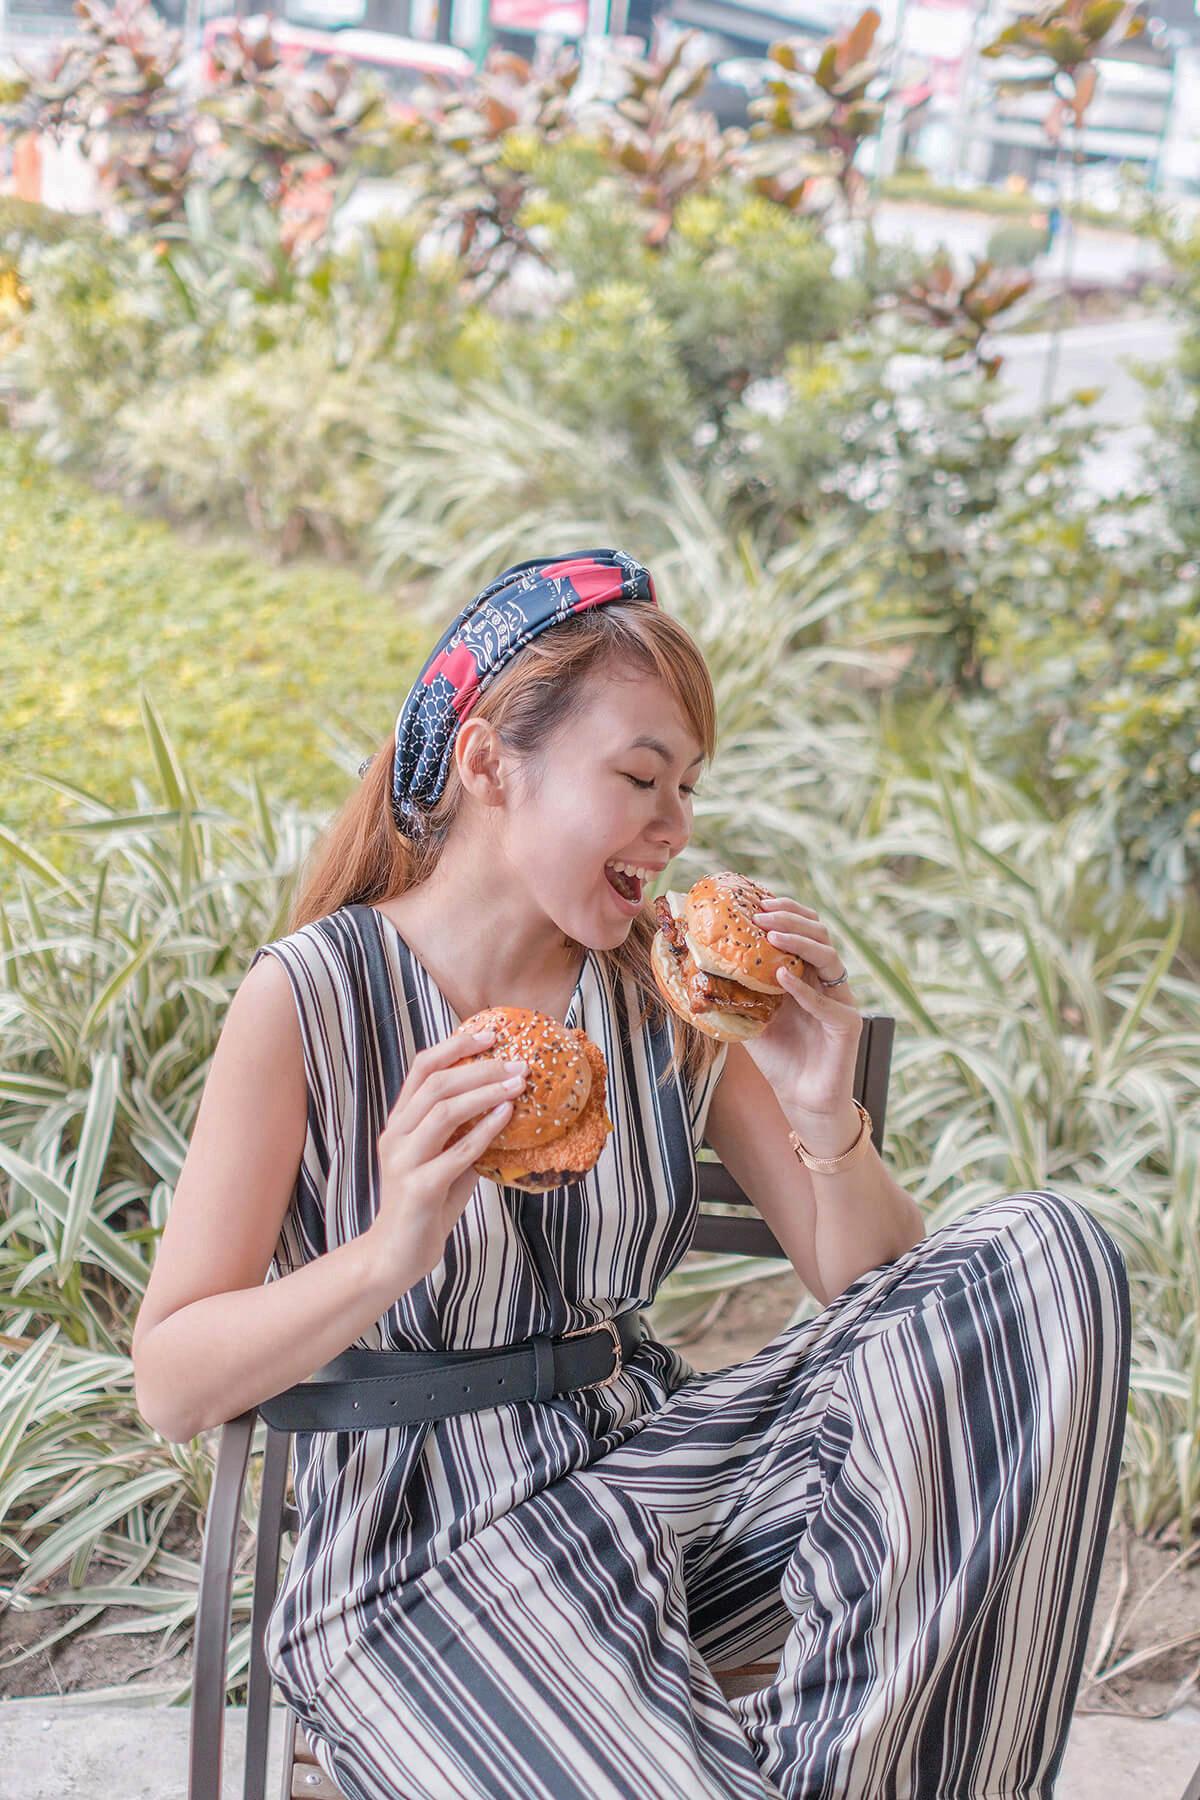 Trice Nagusara Tokyo Tokyo Wagyu Burger